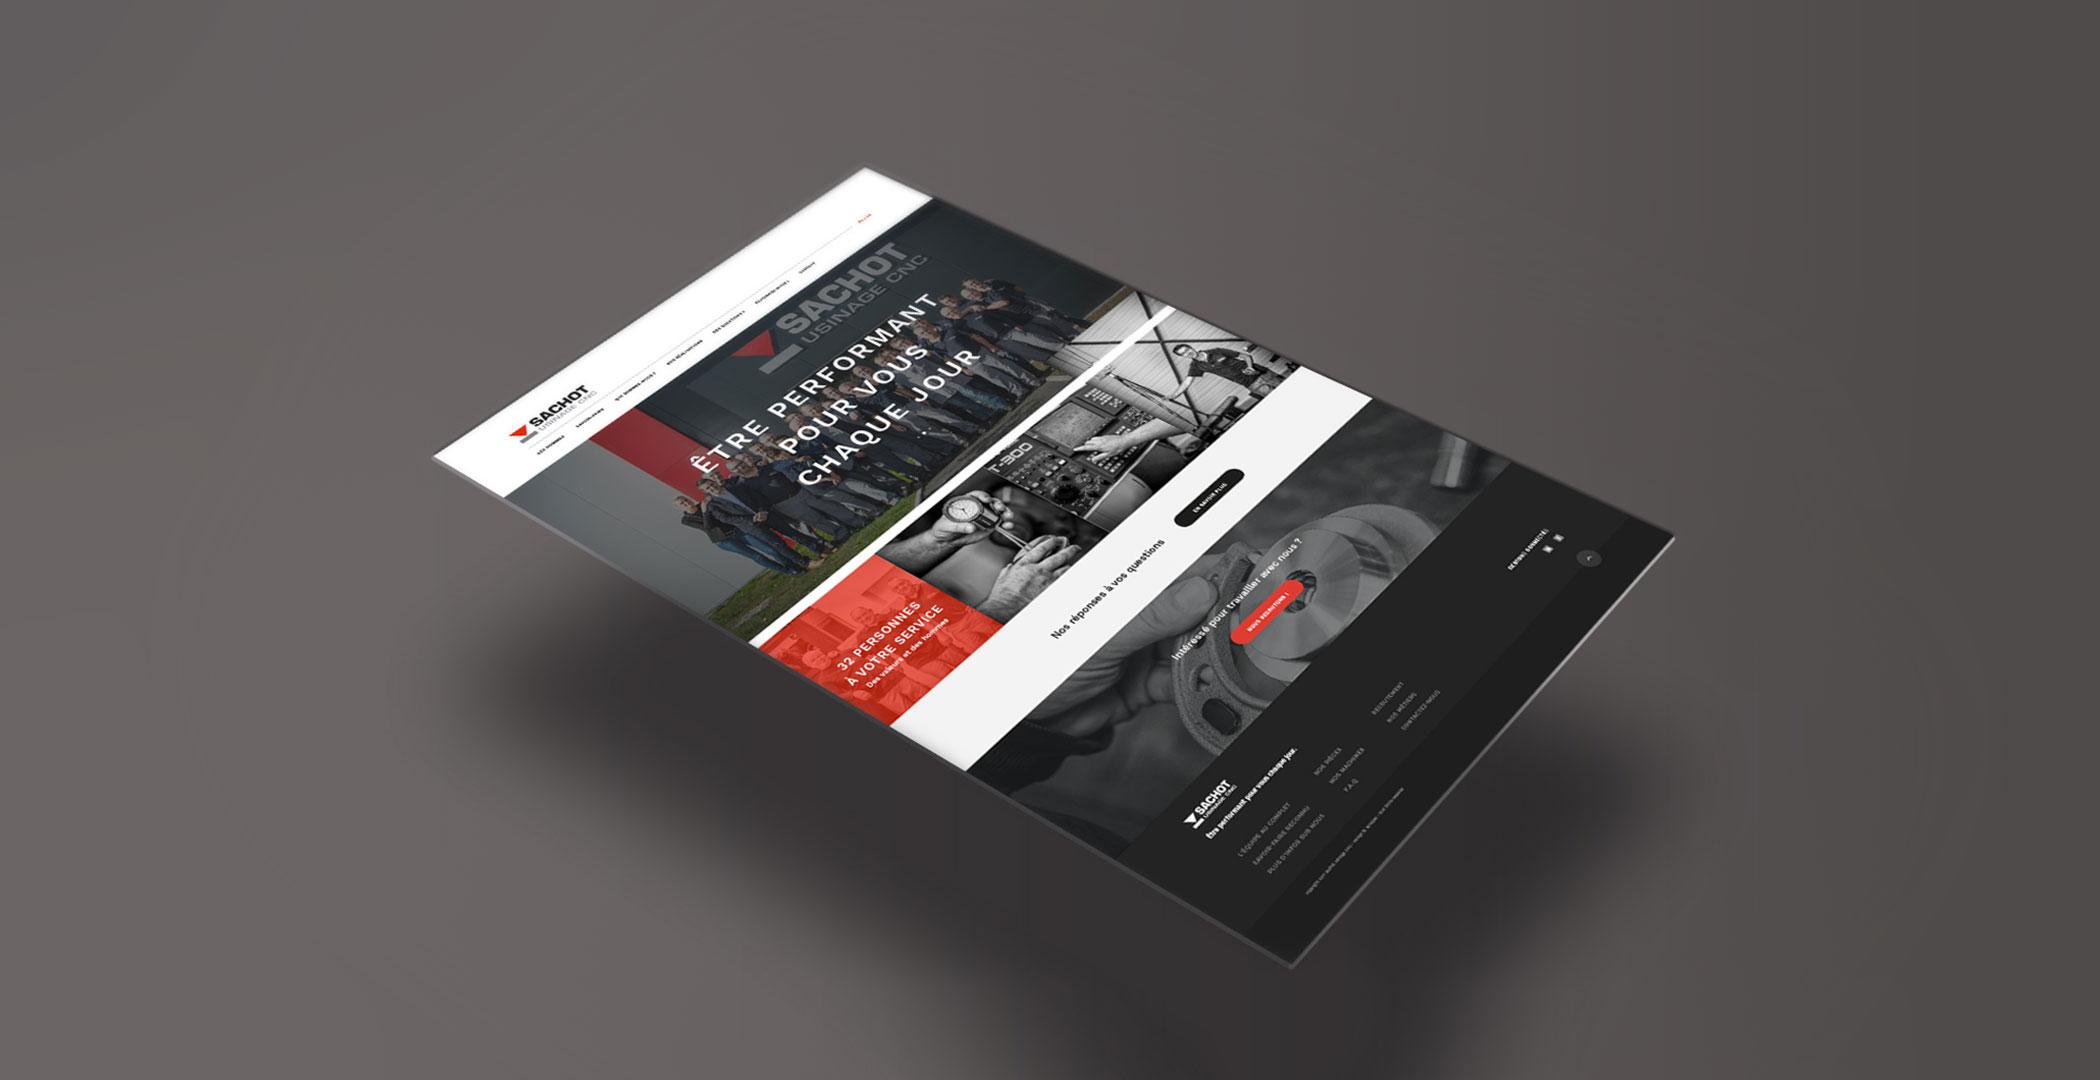 Sachot design interface